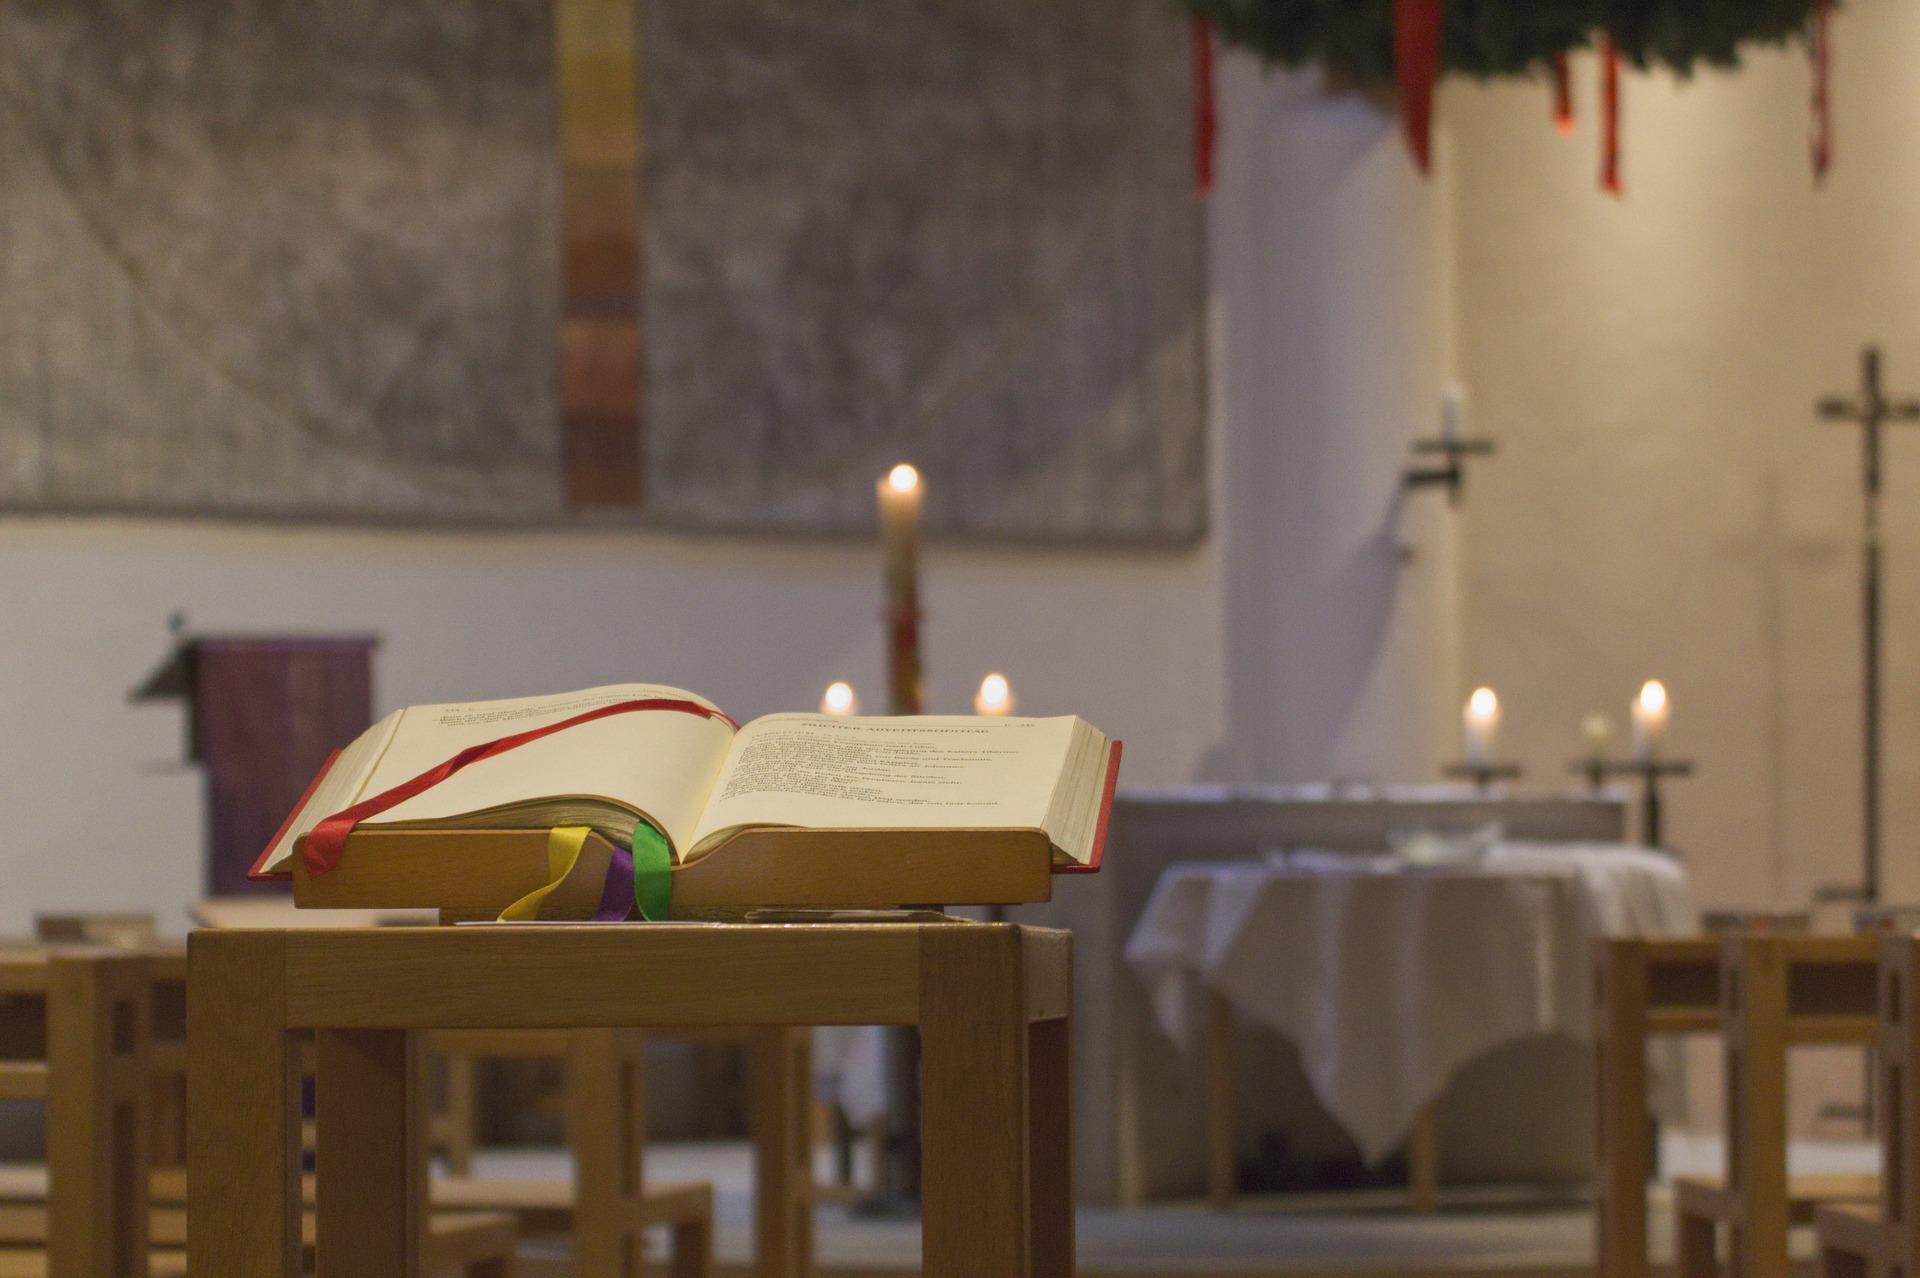 Prädikantenfortbildungsreihe - Psalmen predigen